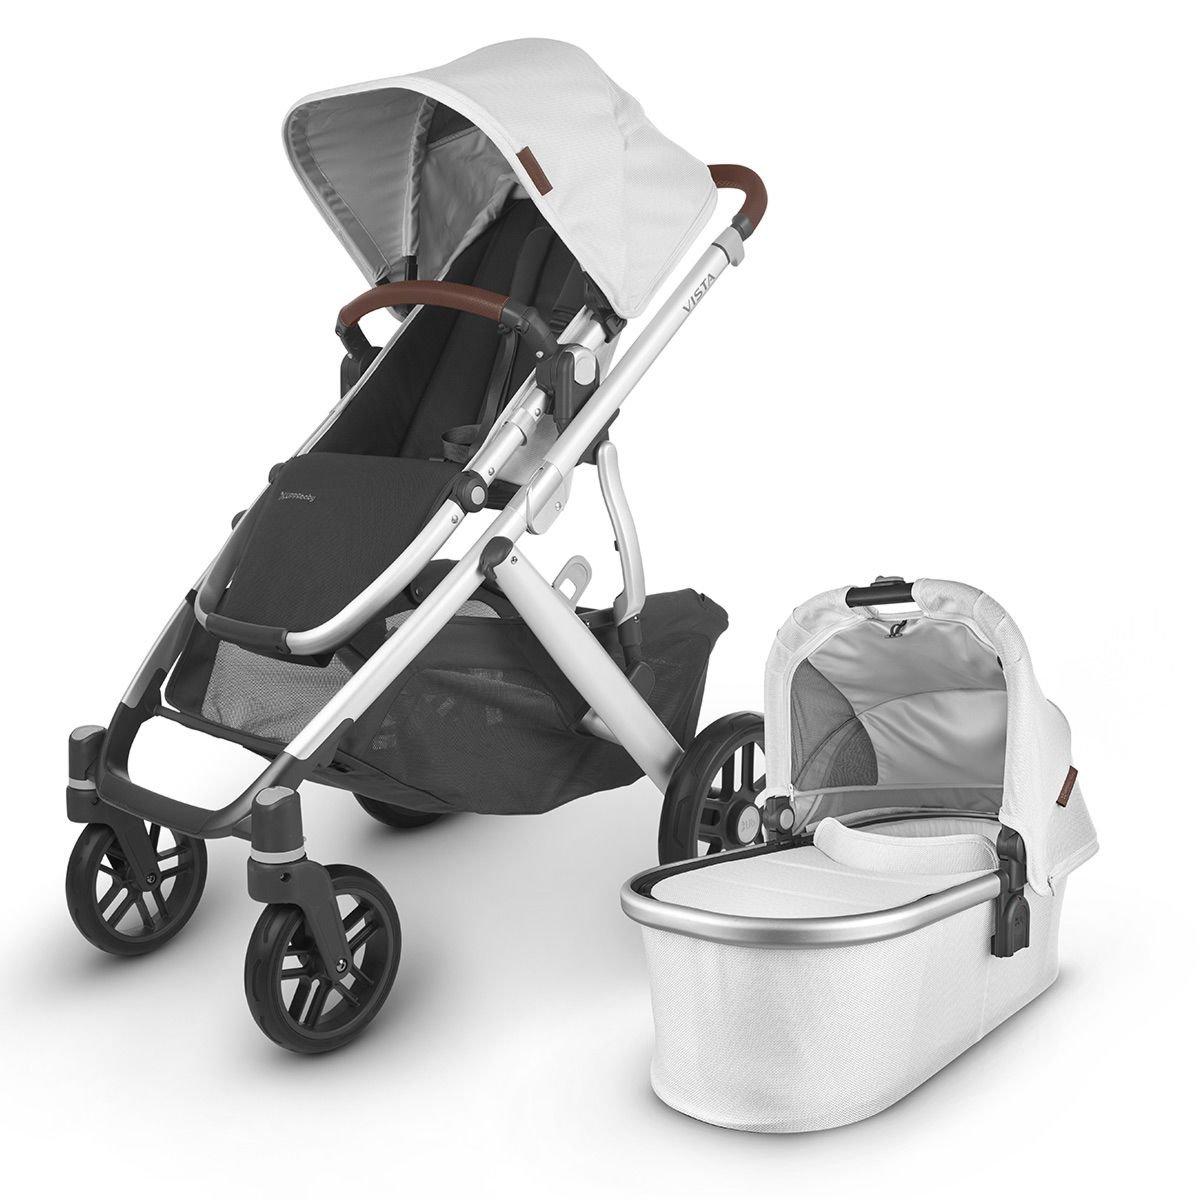 UPPABaby VISTA V2 Stroller - BRYCE (White Marl/Silver/Saddle Leather)